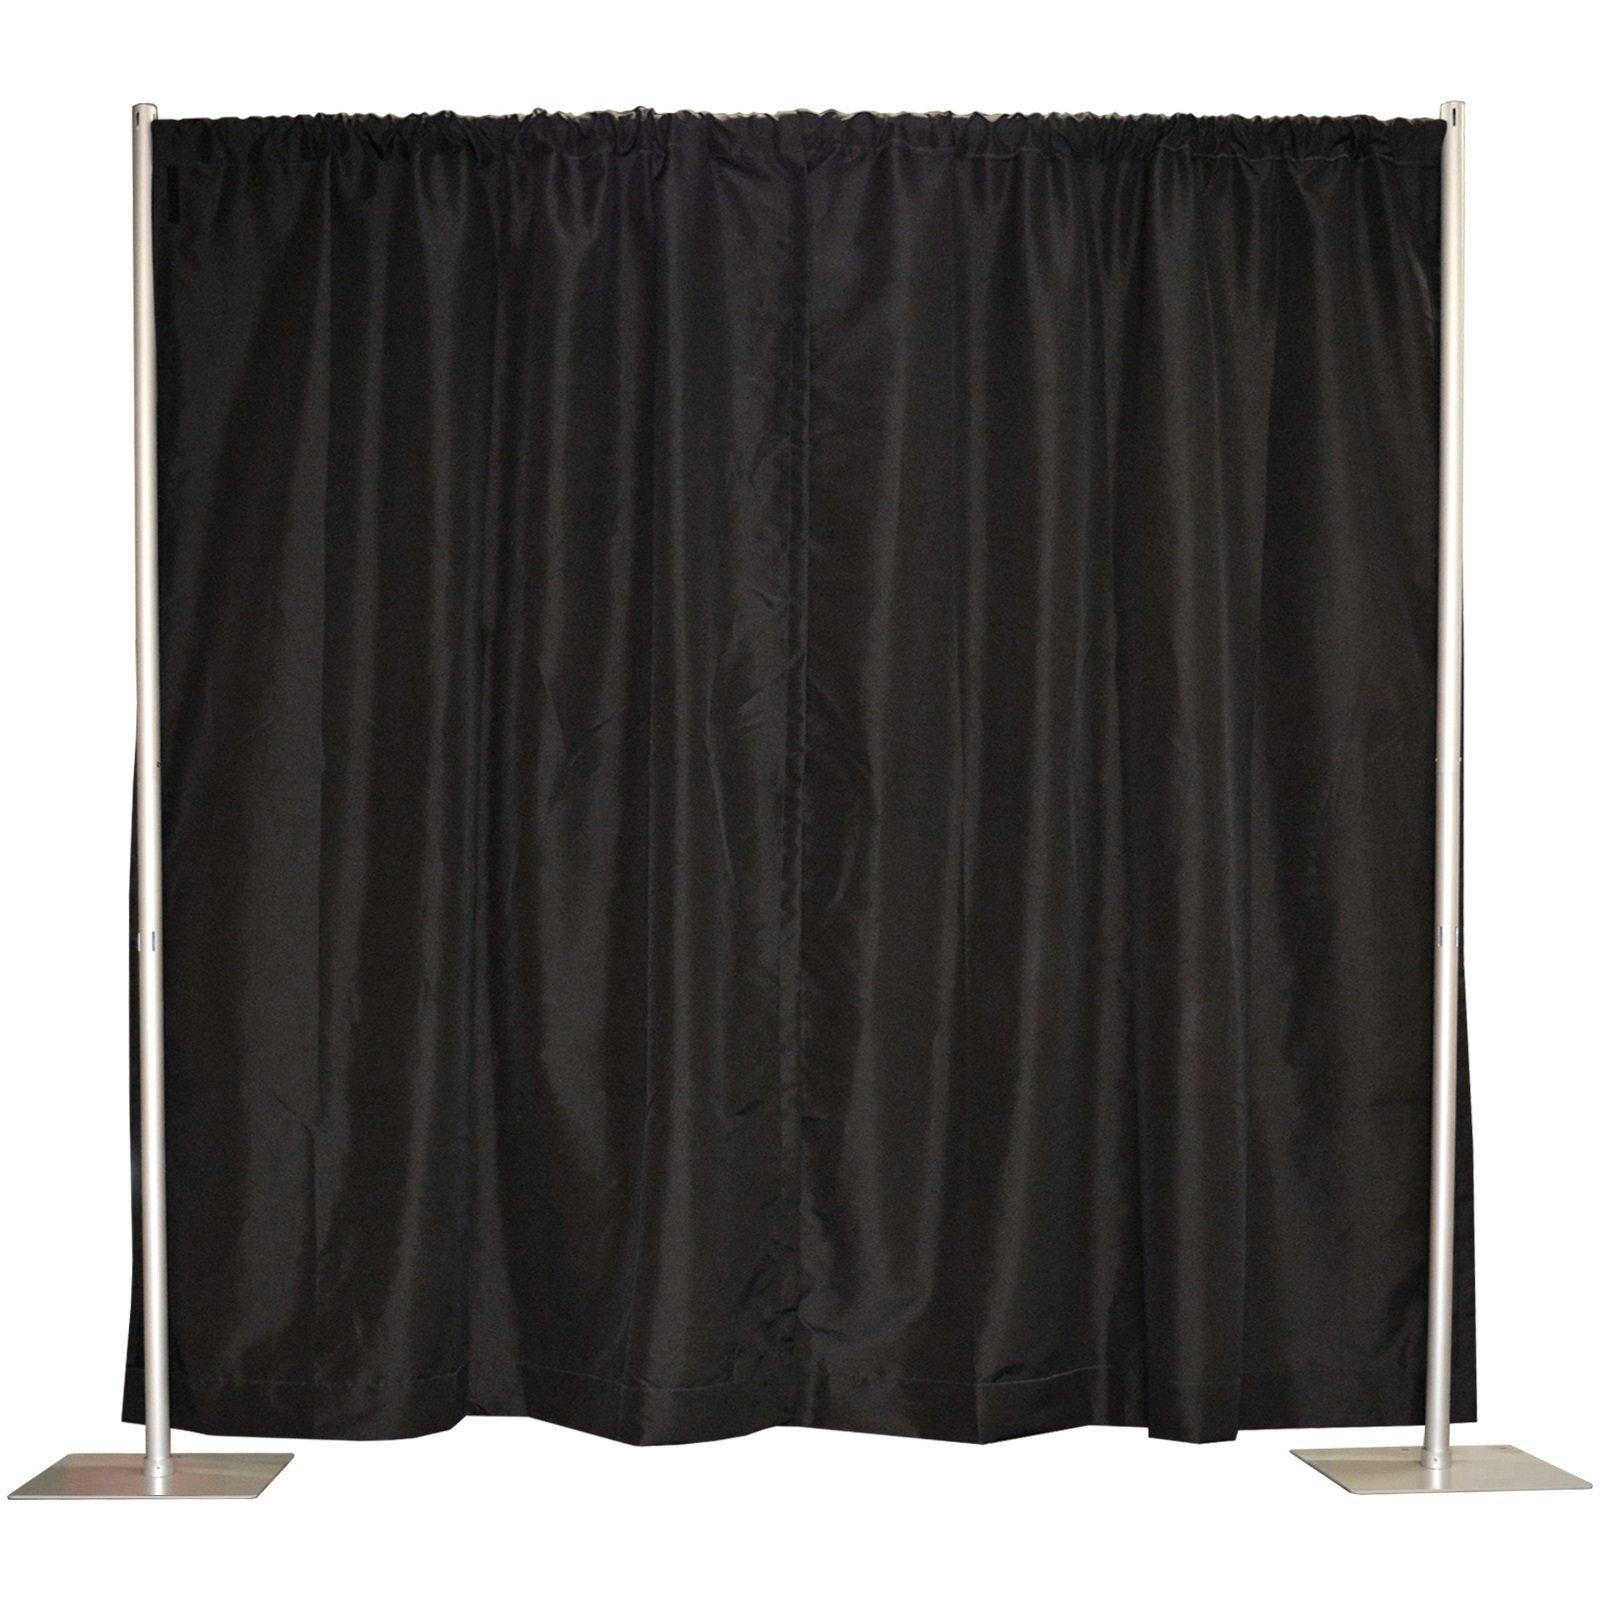 Pipe and Drape, Backdrop Kit in Premier Fabric (8' x 10' Black)